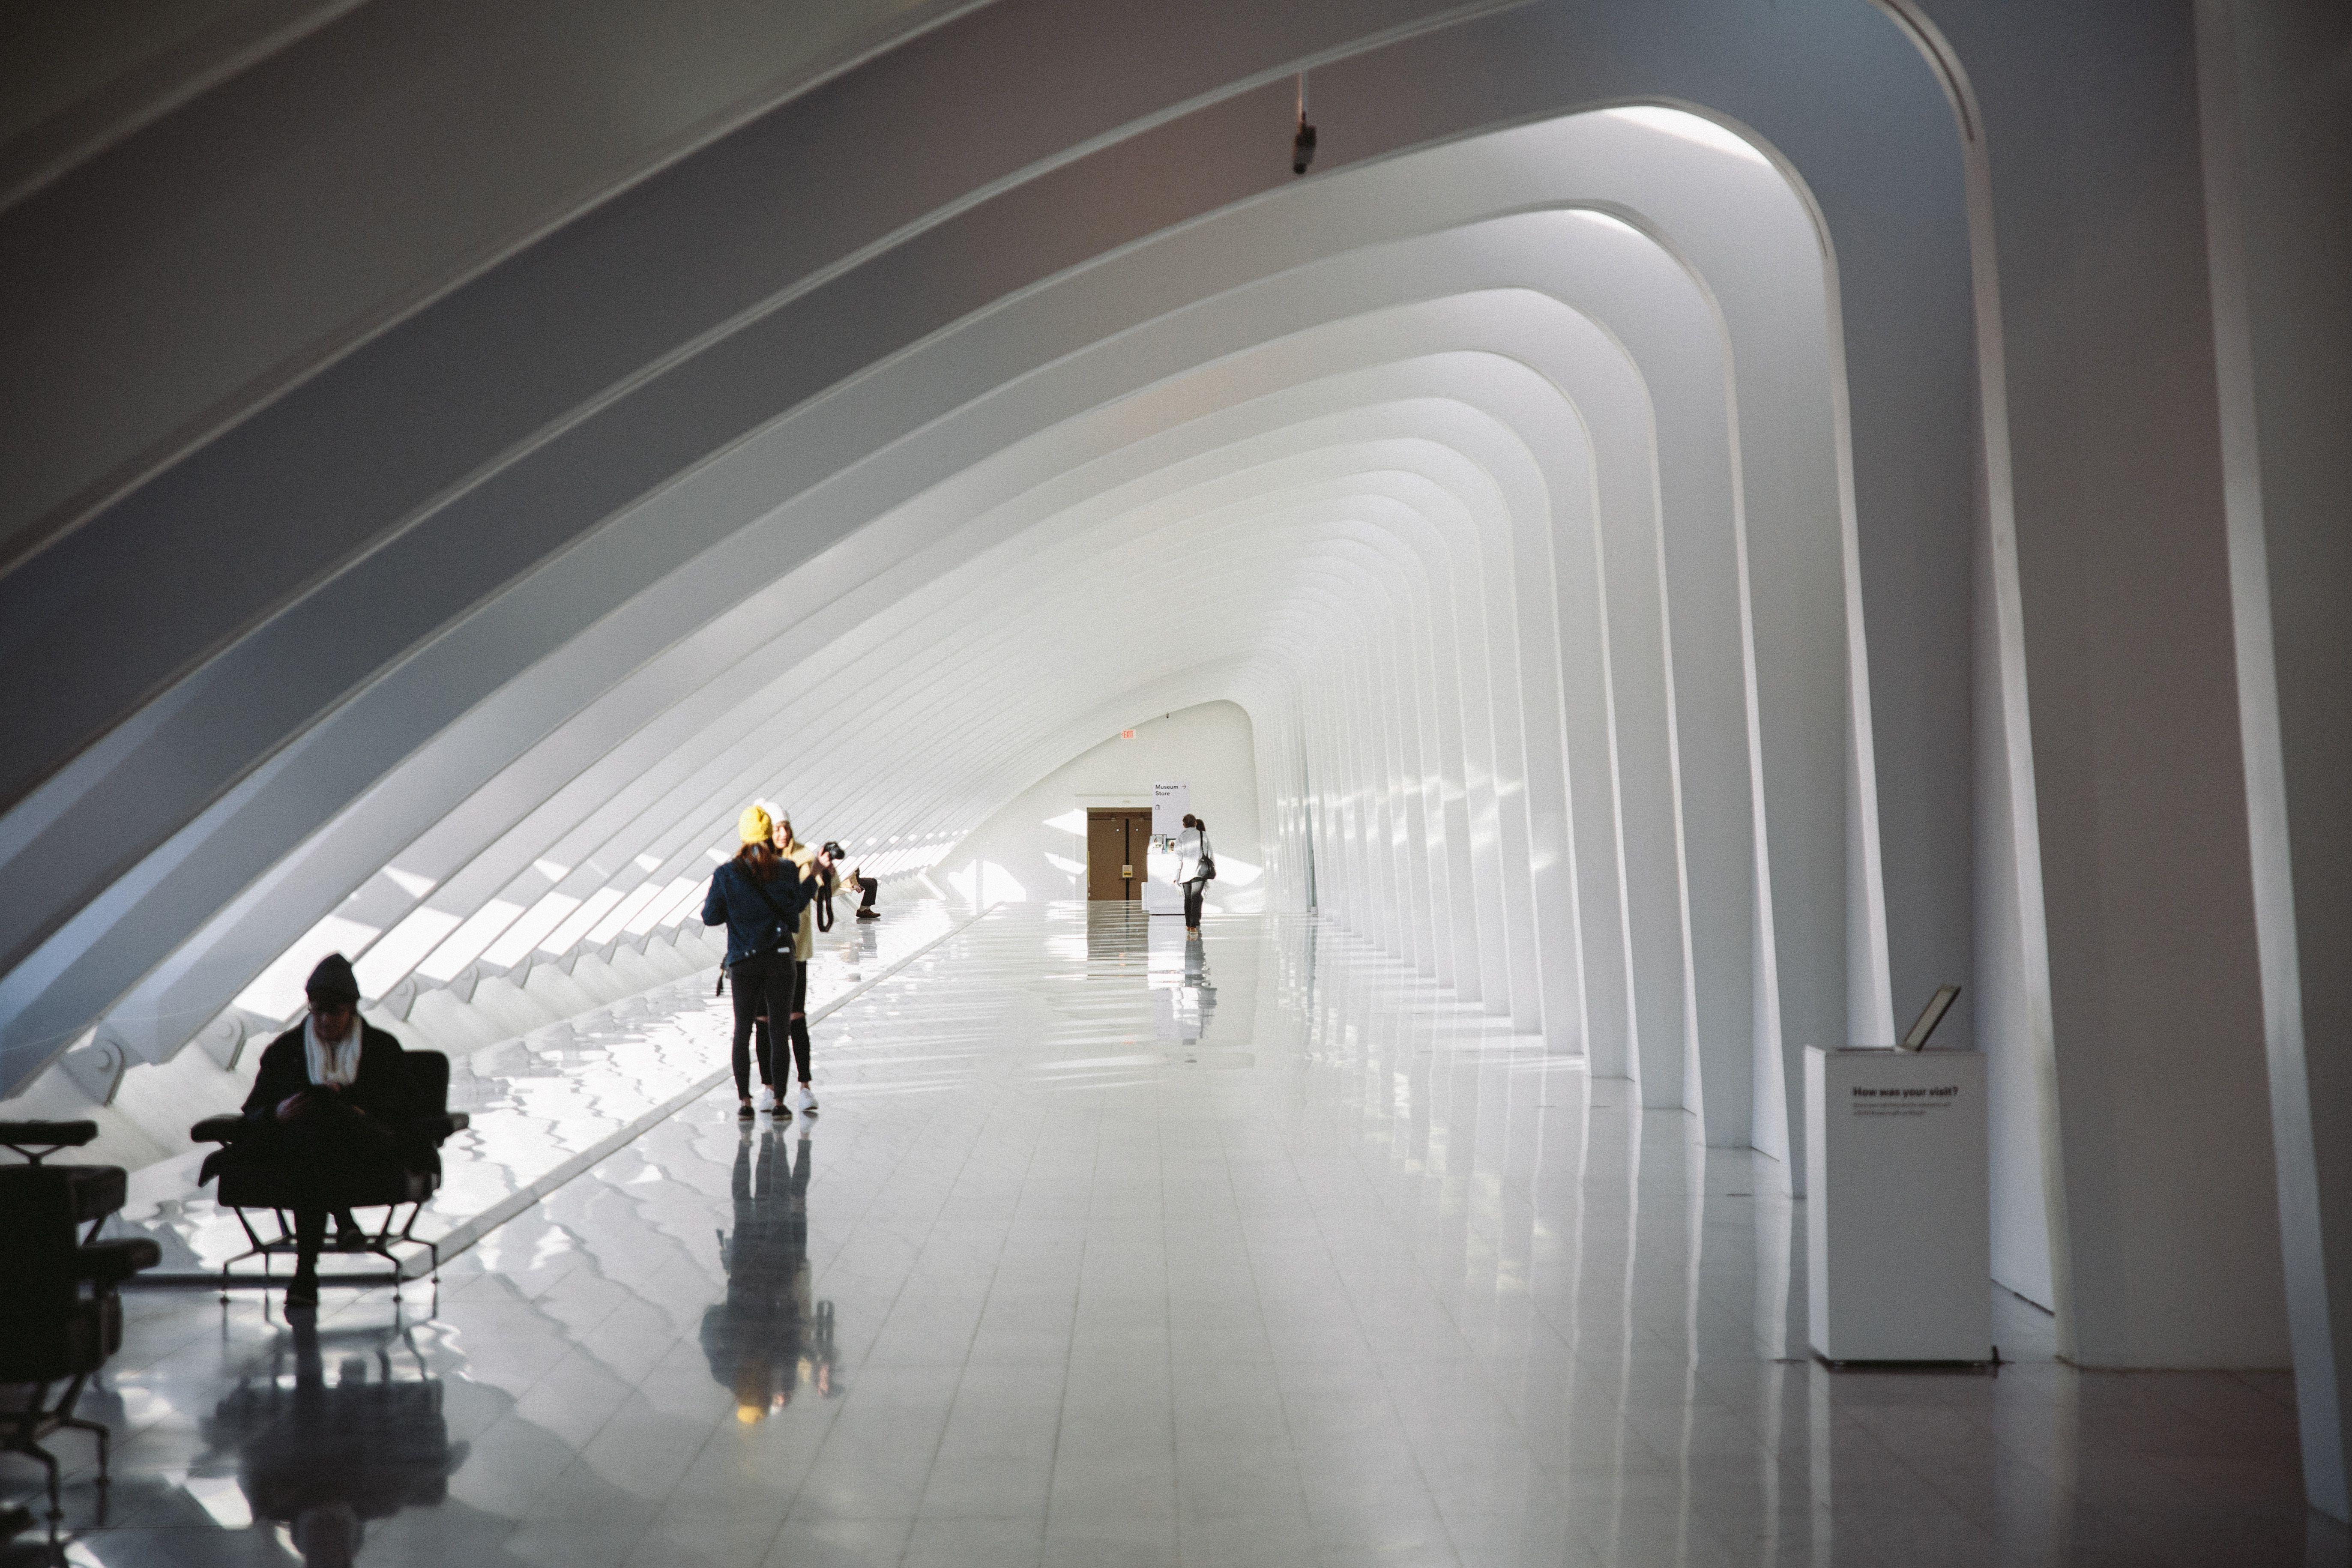 Interior architecturally designed hallway in the Milwaukee Art Museum